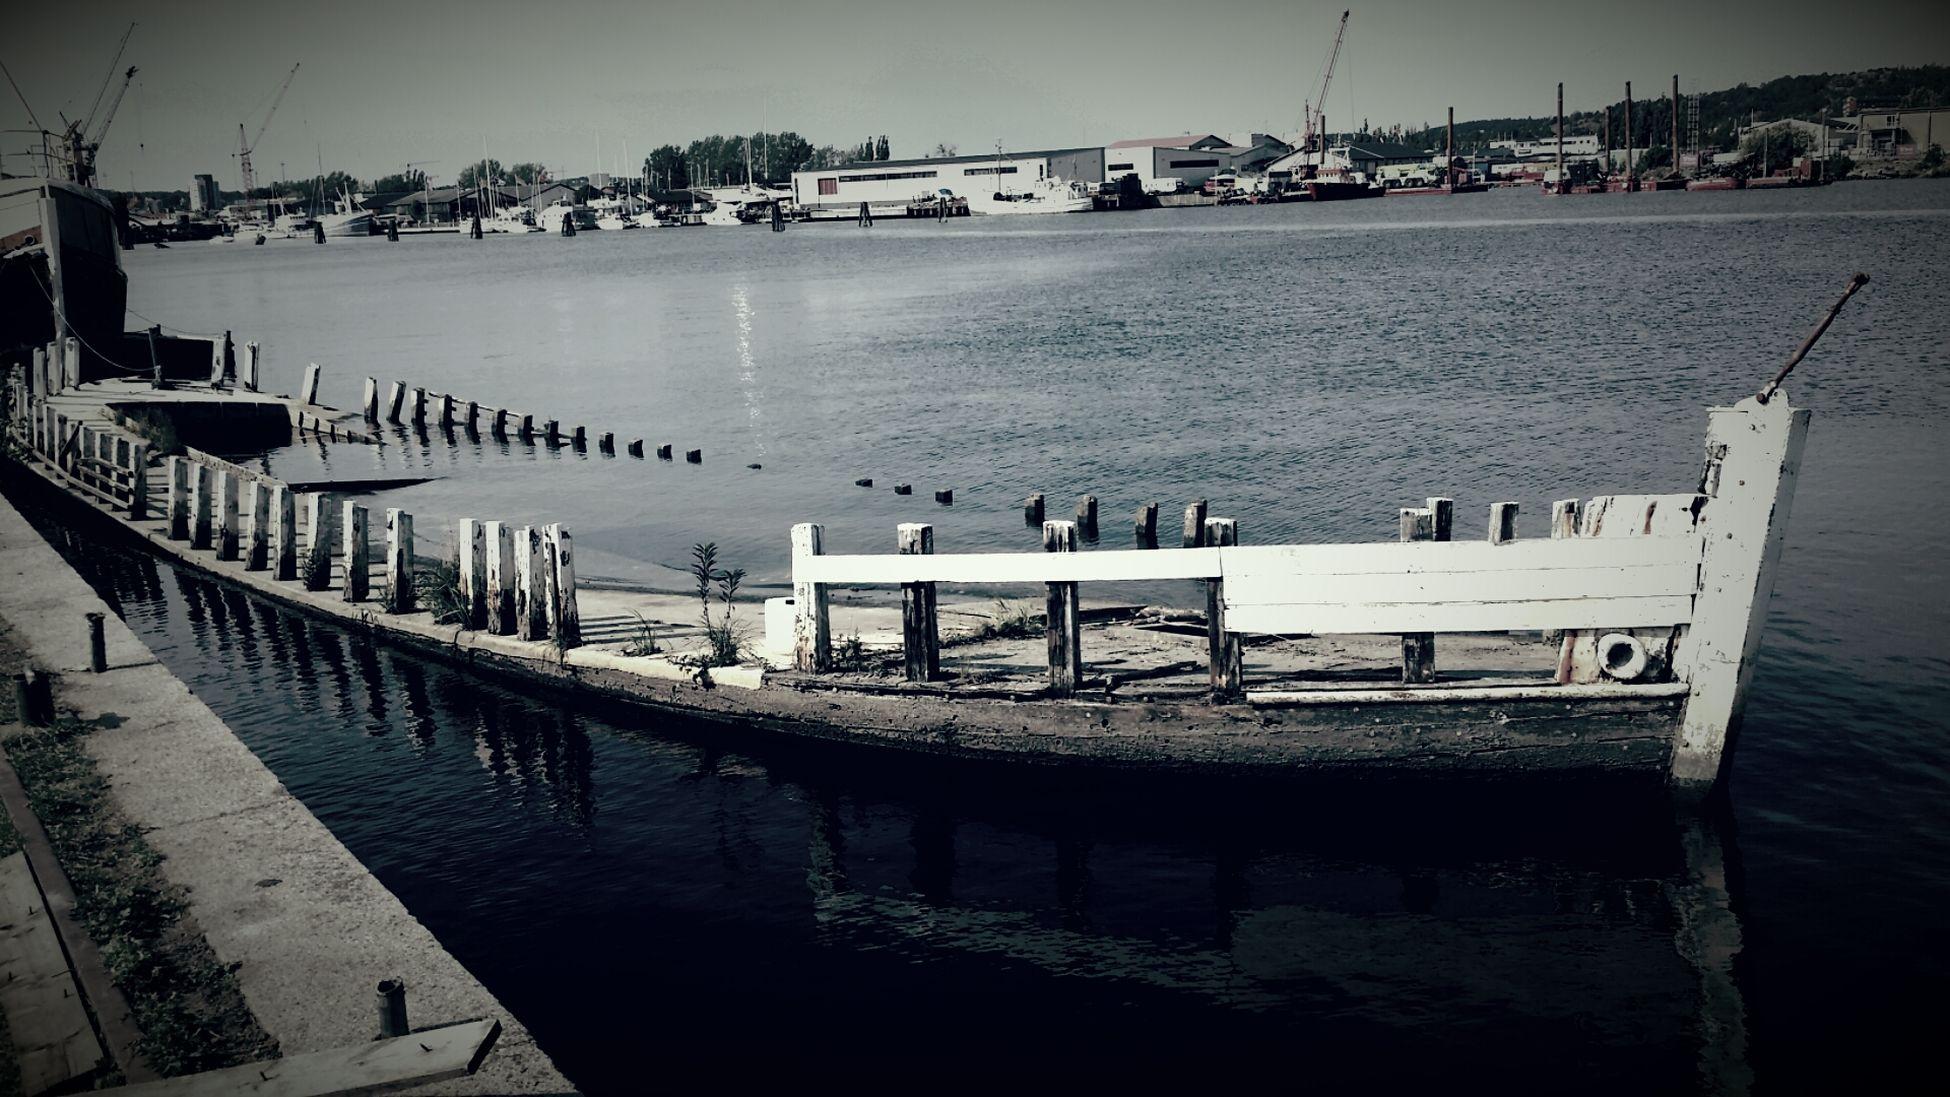 Boat trip...?